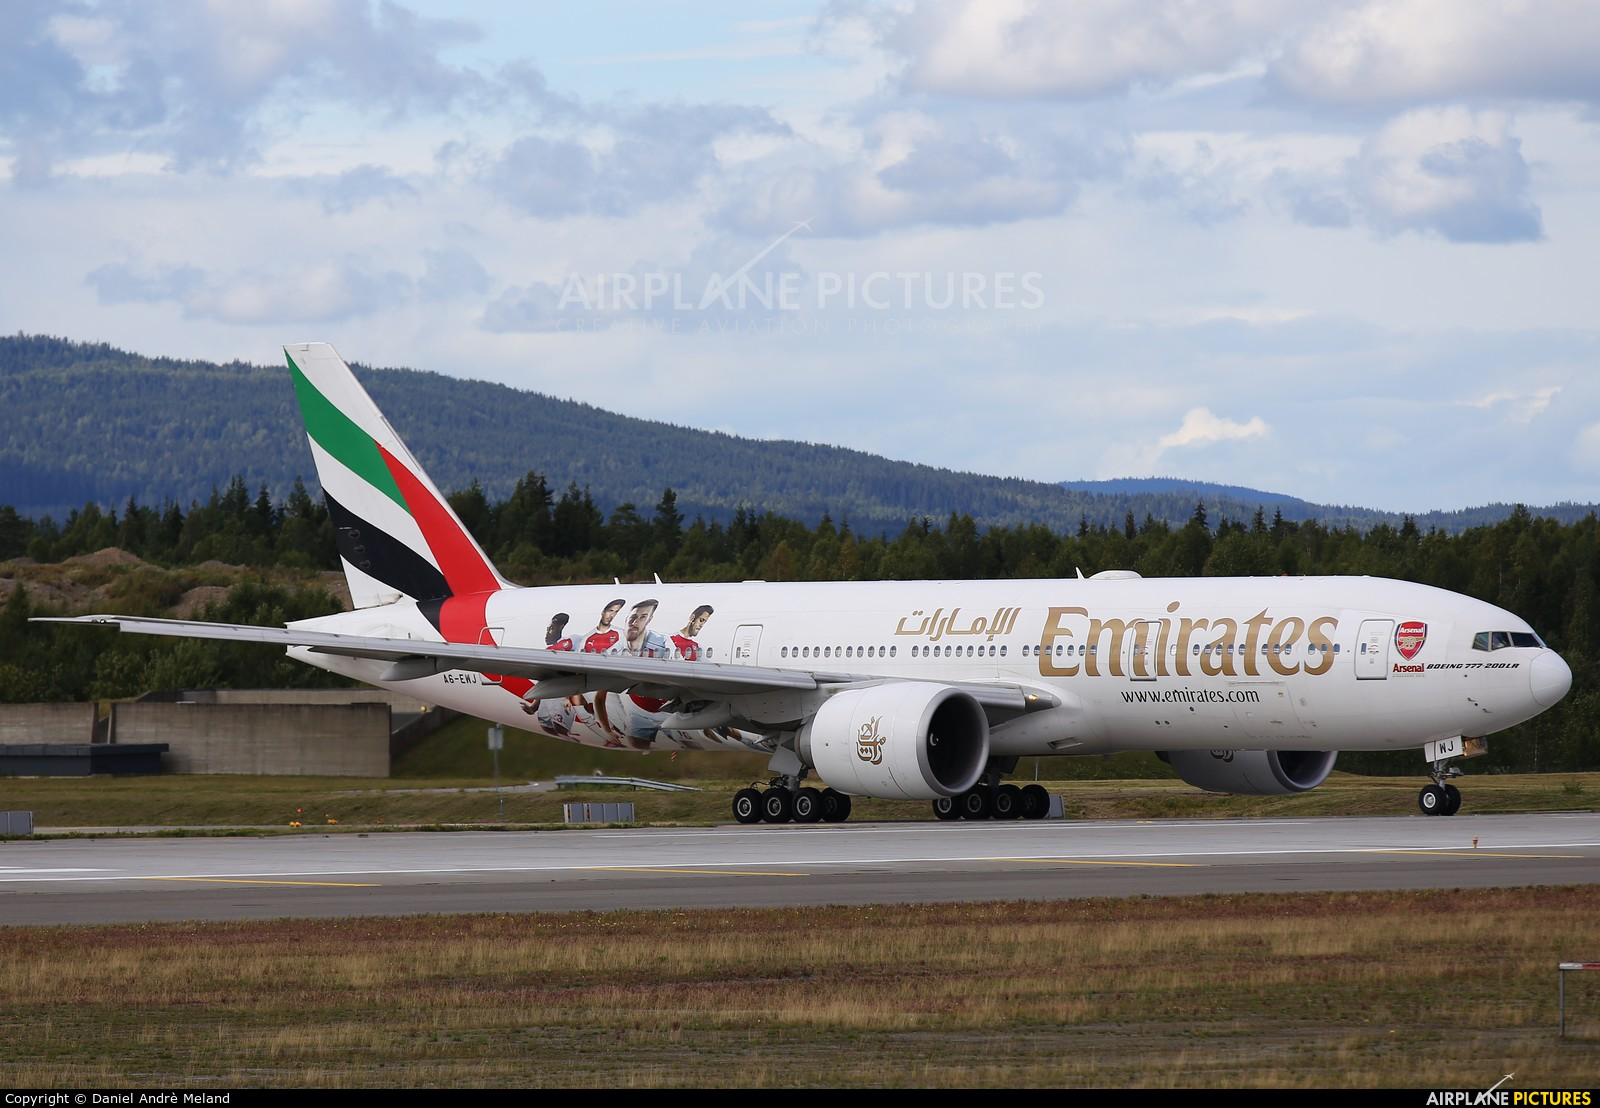 Emirates Airlines A6-EWJ aircraft at Oslo - Gardermoen